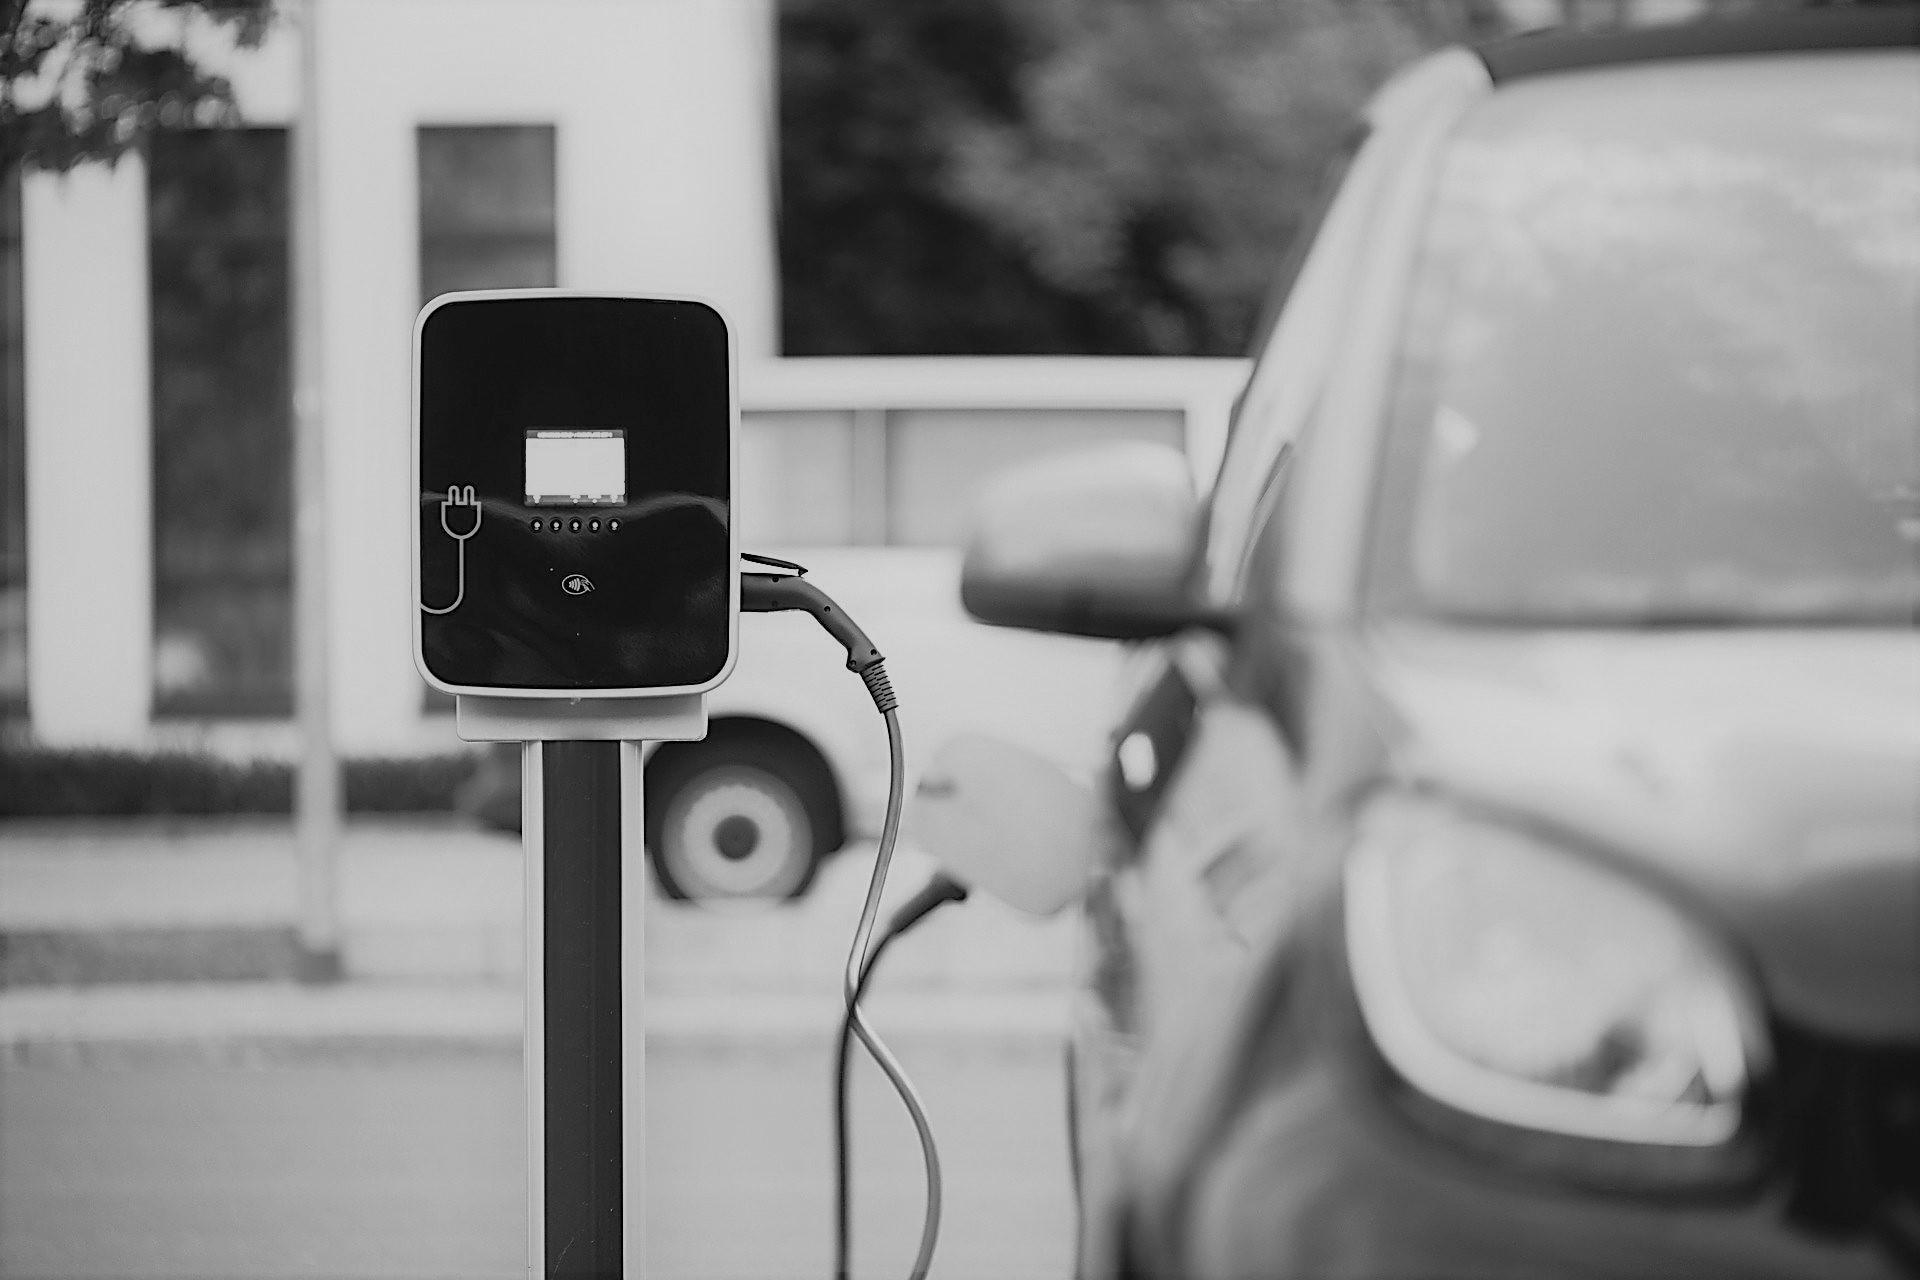 Elektromobilität im Ausbau